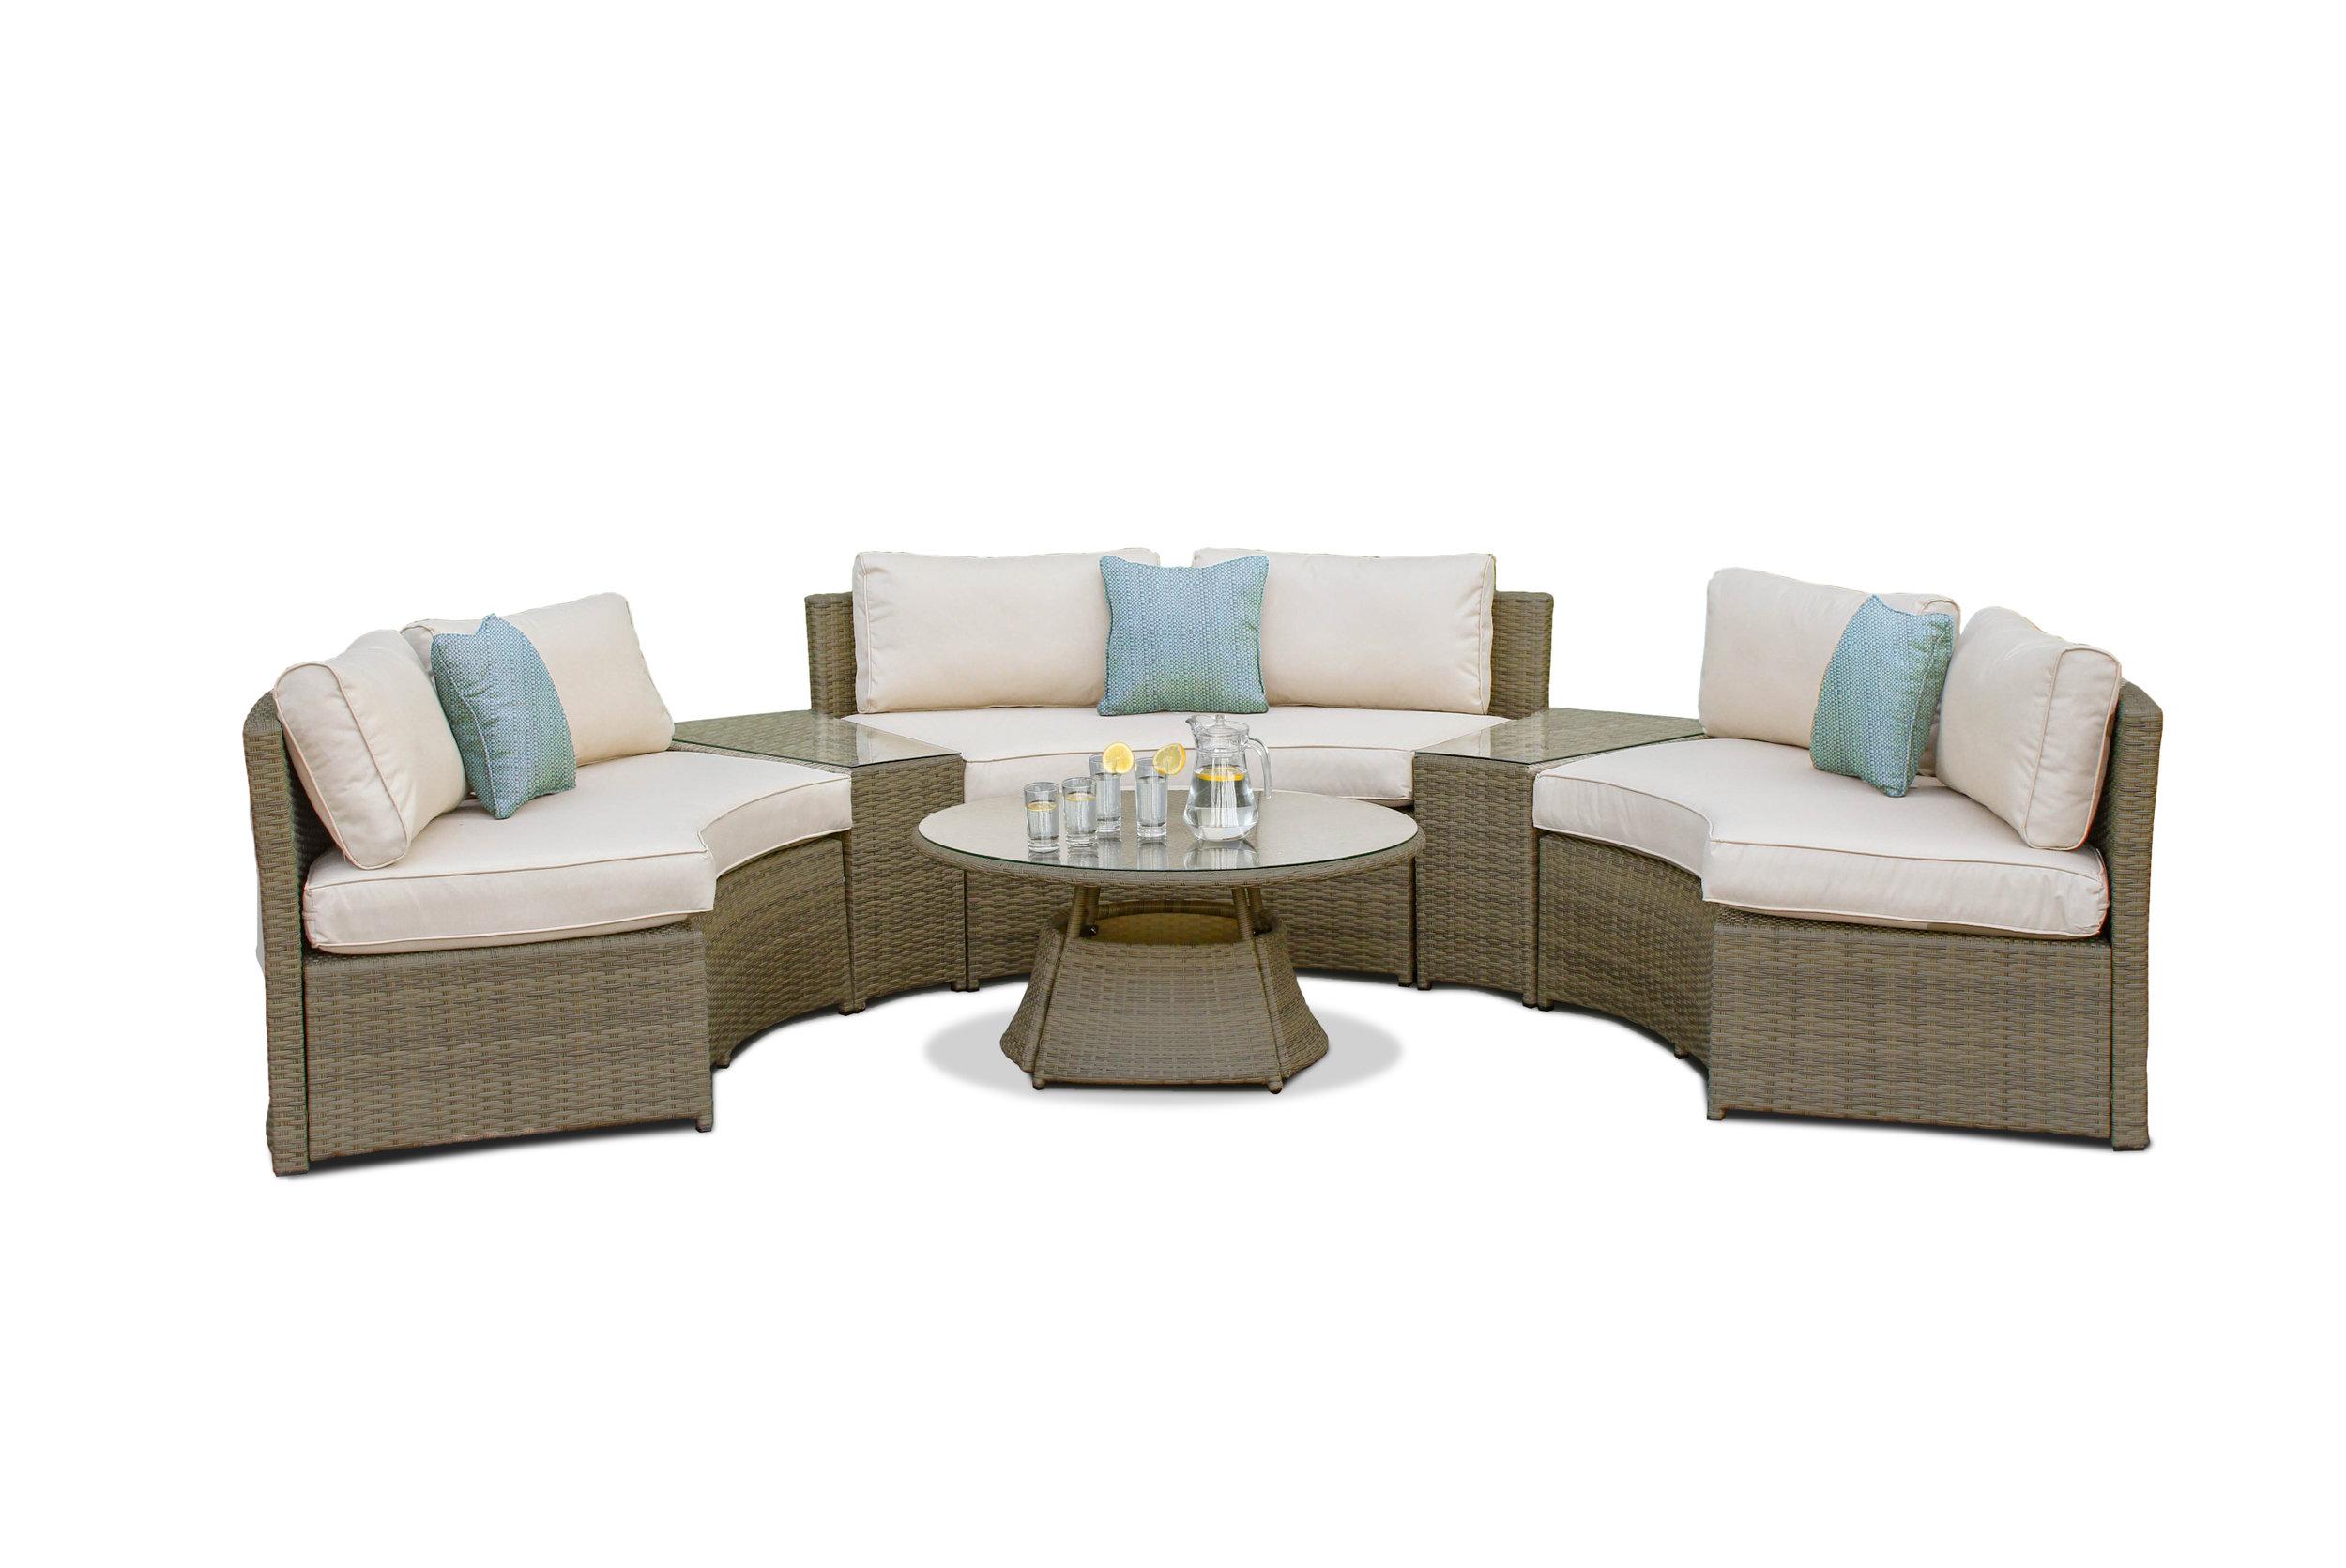 maze rattan natural milan corner sofa set green cushions narrow table with shelves garden furniture just interiors tuscany half moon white out jpg